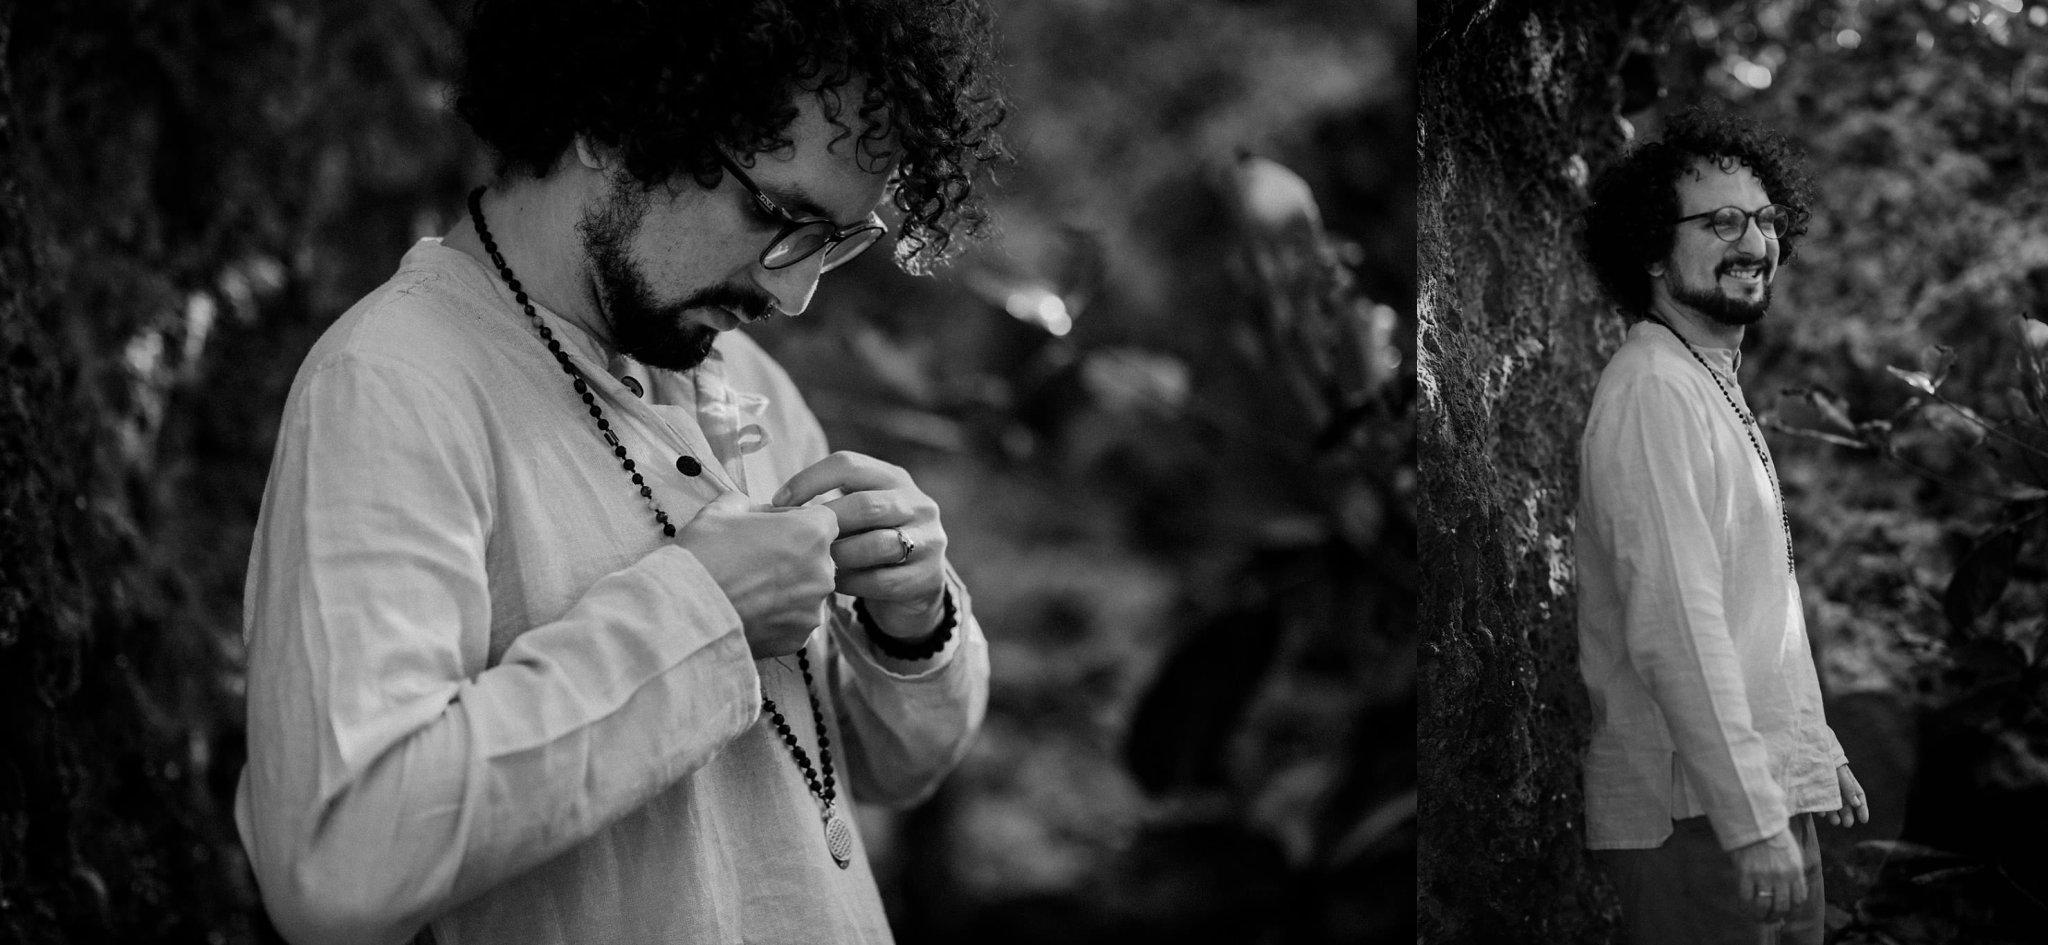 Puerto-Rico-Elopement_Lume-Photography-16.jpg